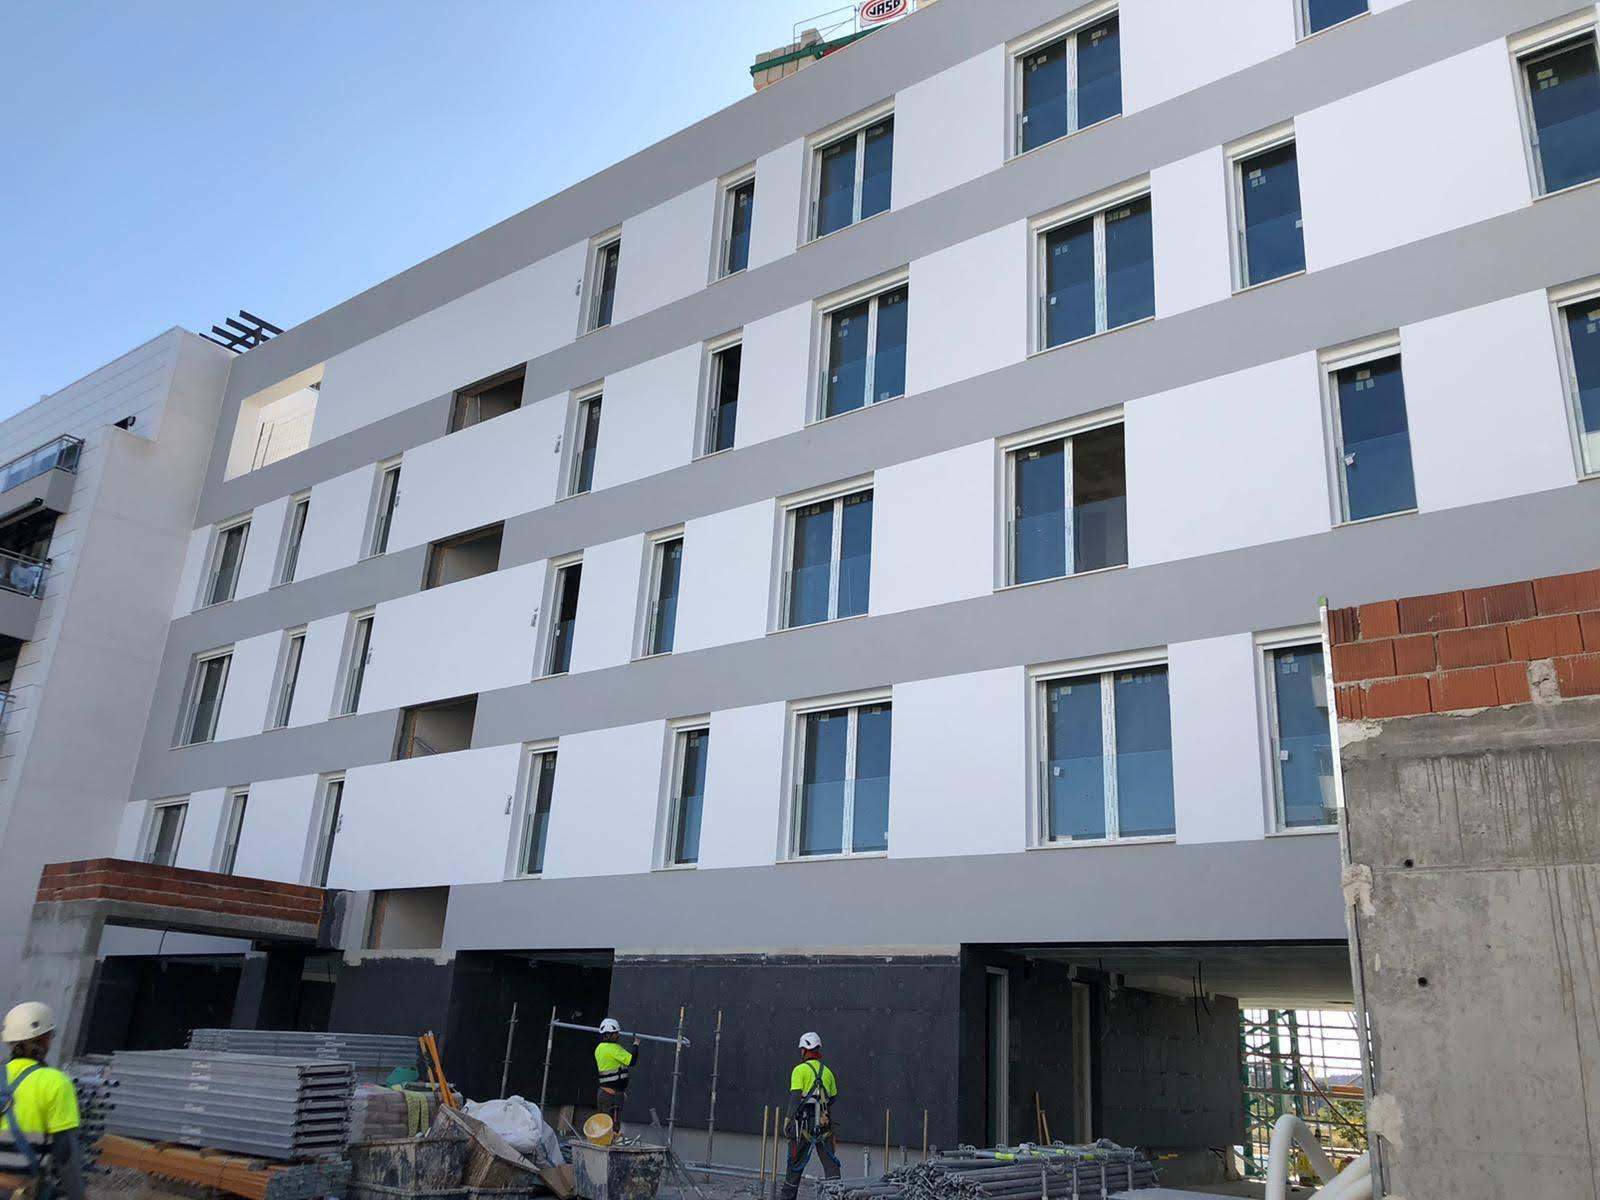 Proceso de edificación / DMDV Arquitectos/Landevel ArroyoFresno